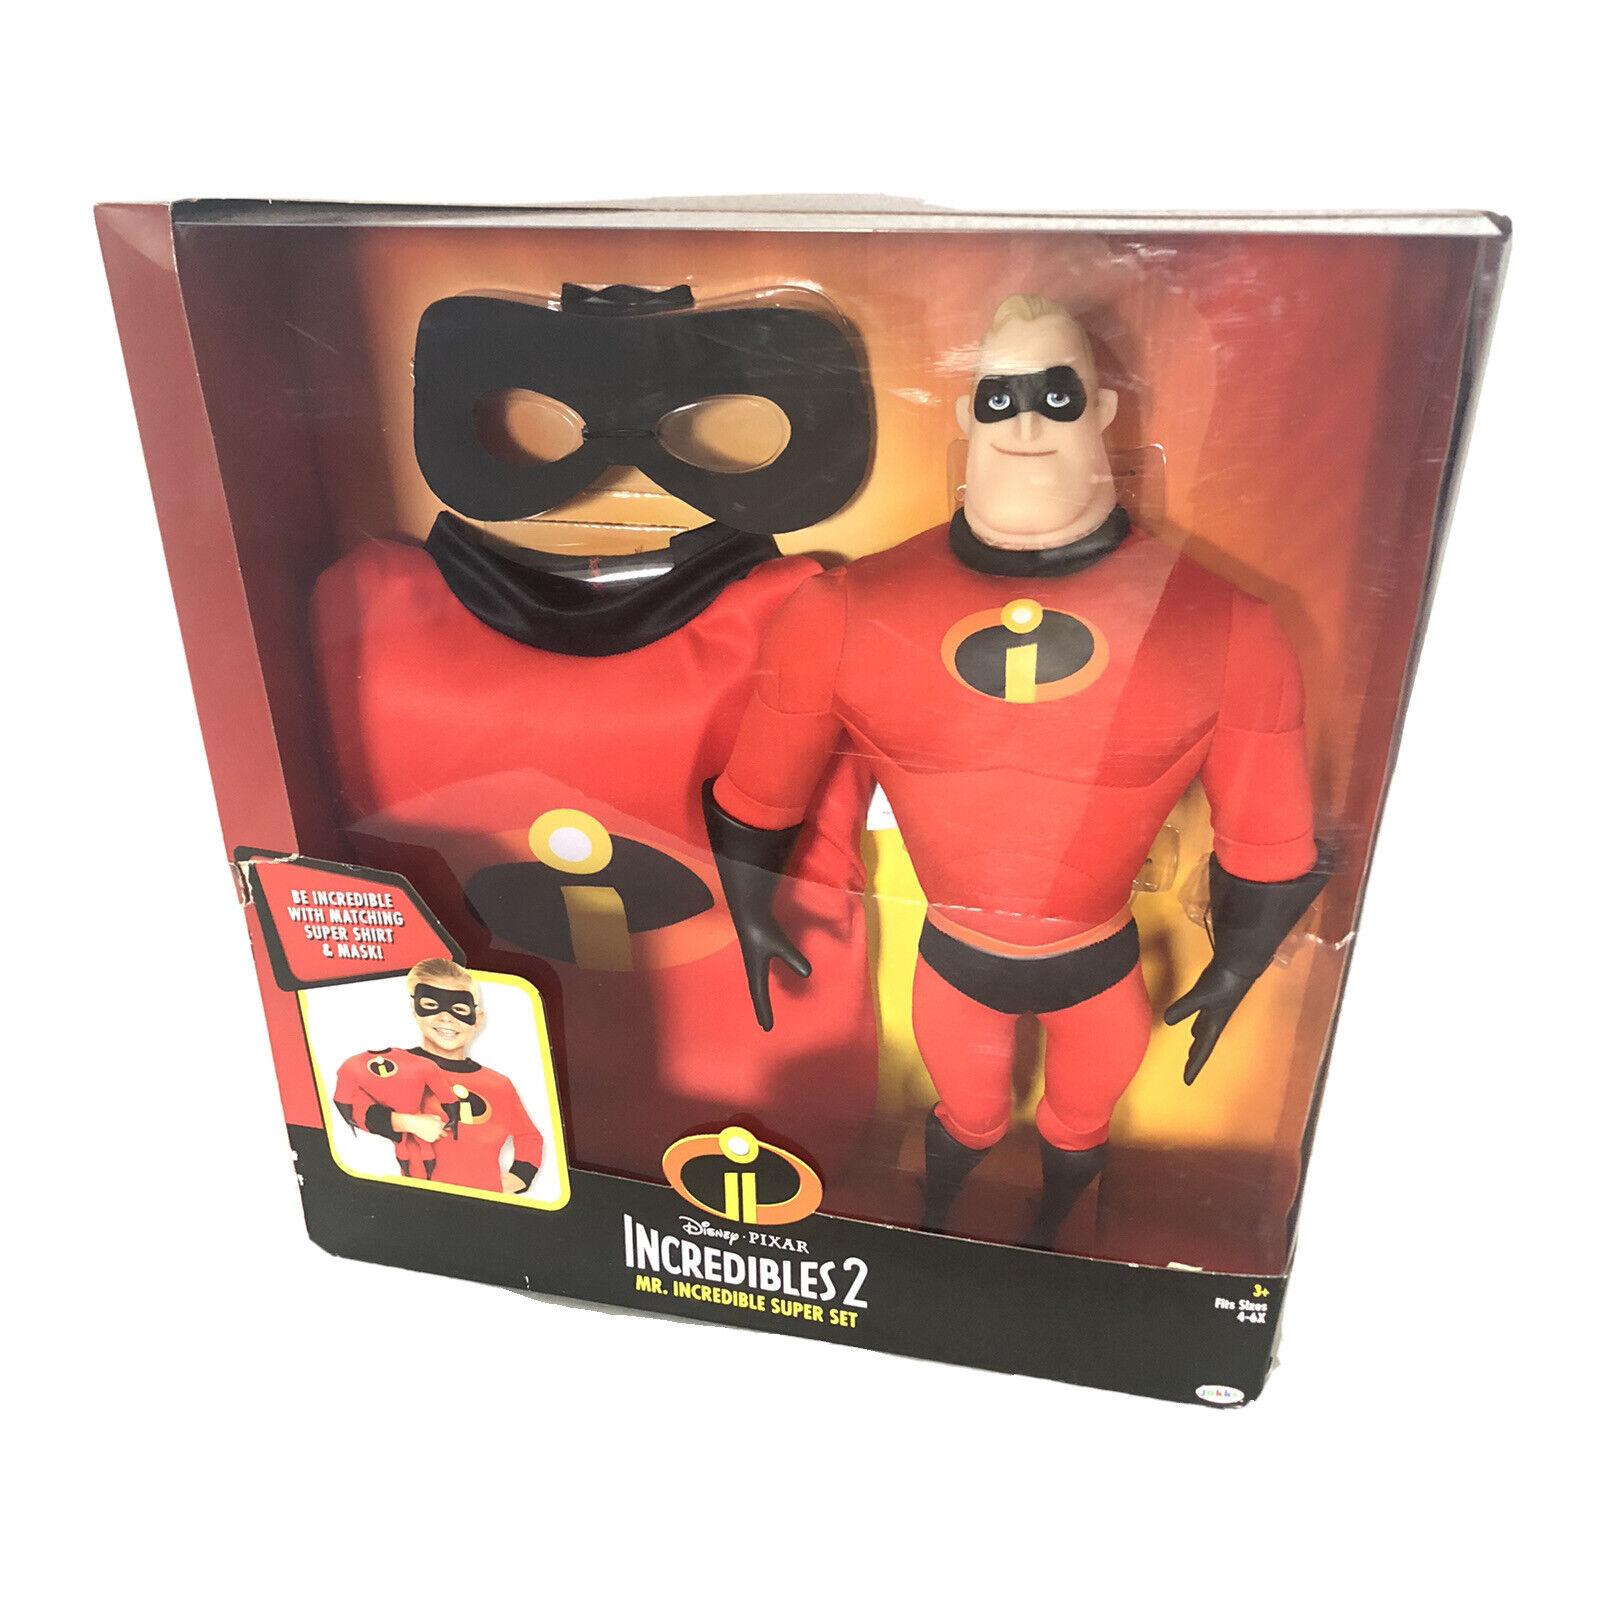 Details about  /Disney Incredibles 2 Mr Incredible Super Set Figure Kids Shirt Mask Dress Up